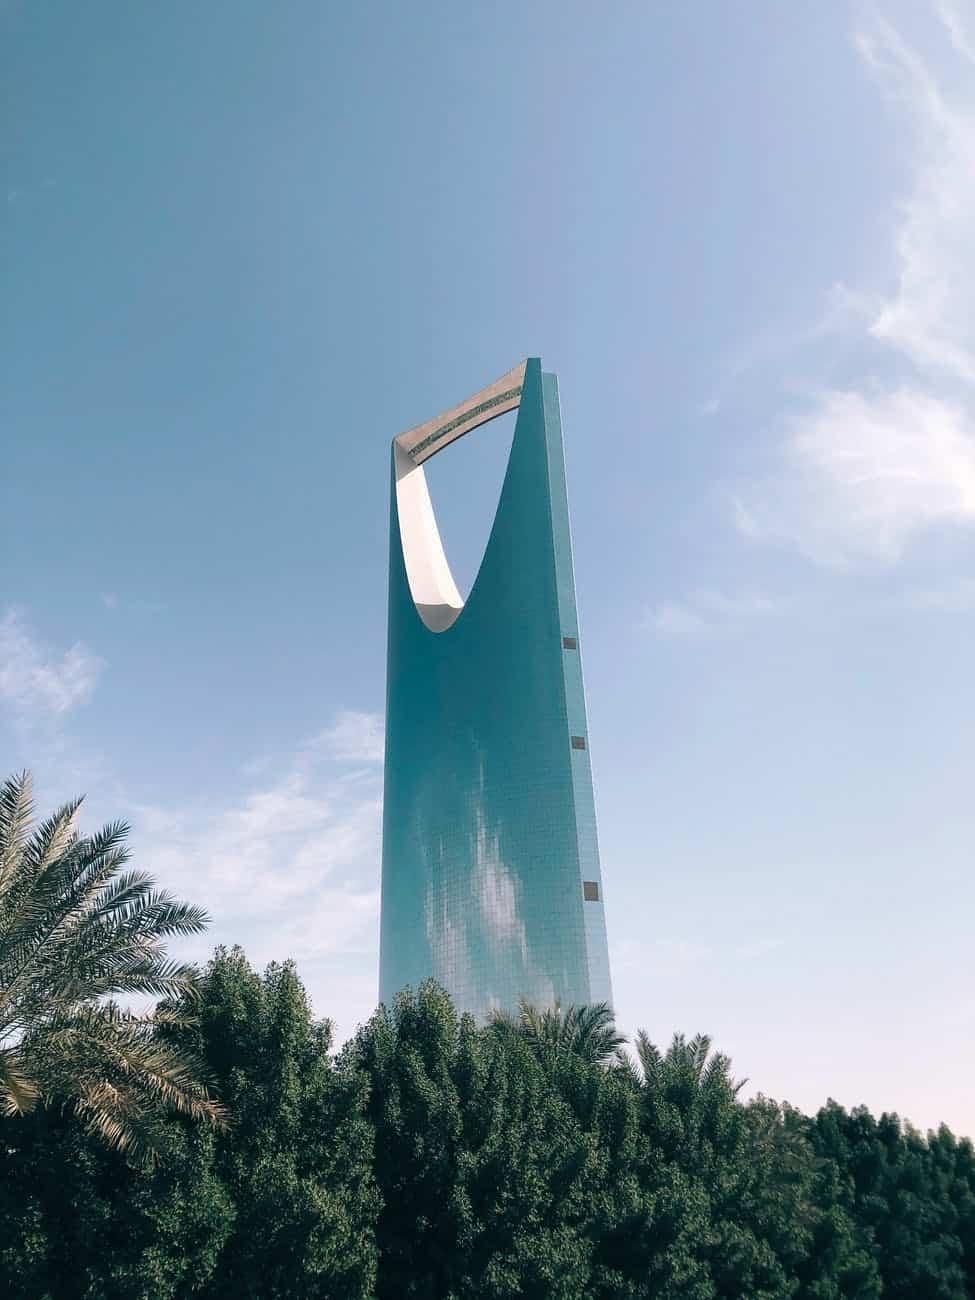 high rise building behind trees under blue sky in Riyadh Saudi Arabia